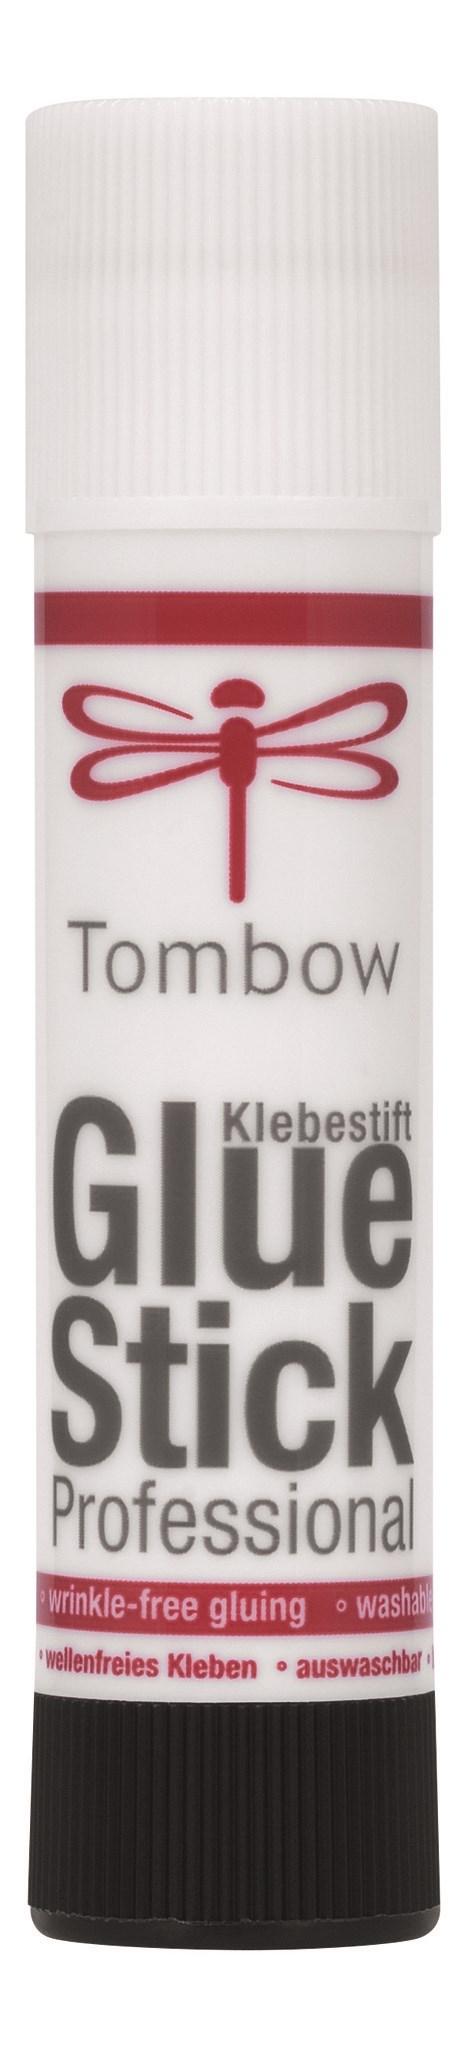 TOMBOW Limstift 22 g